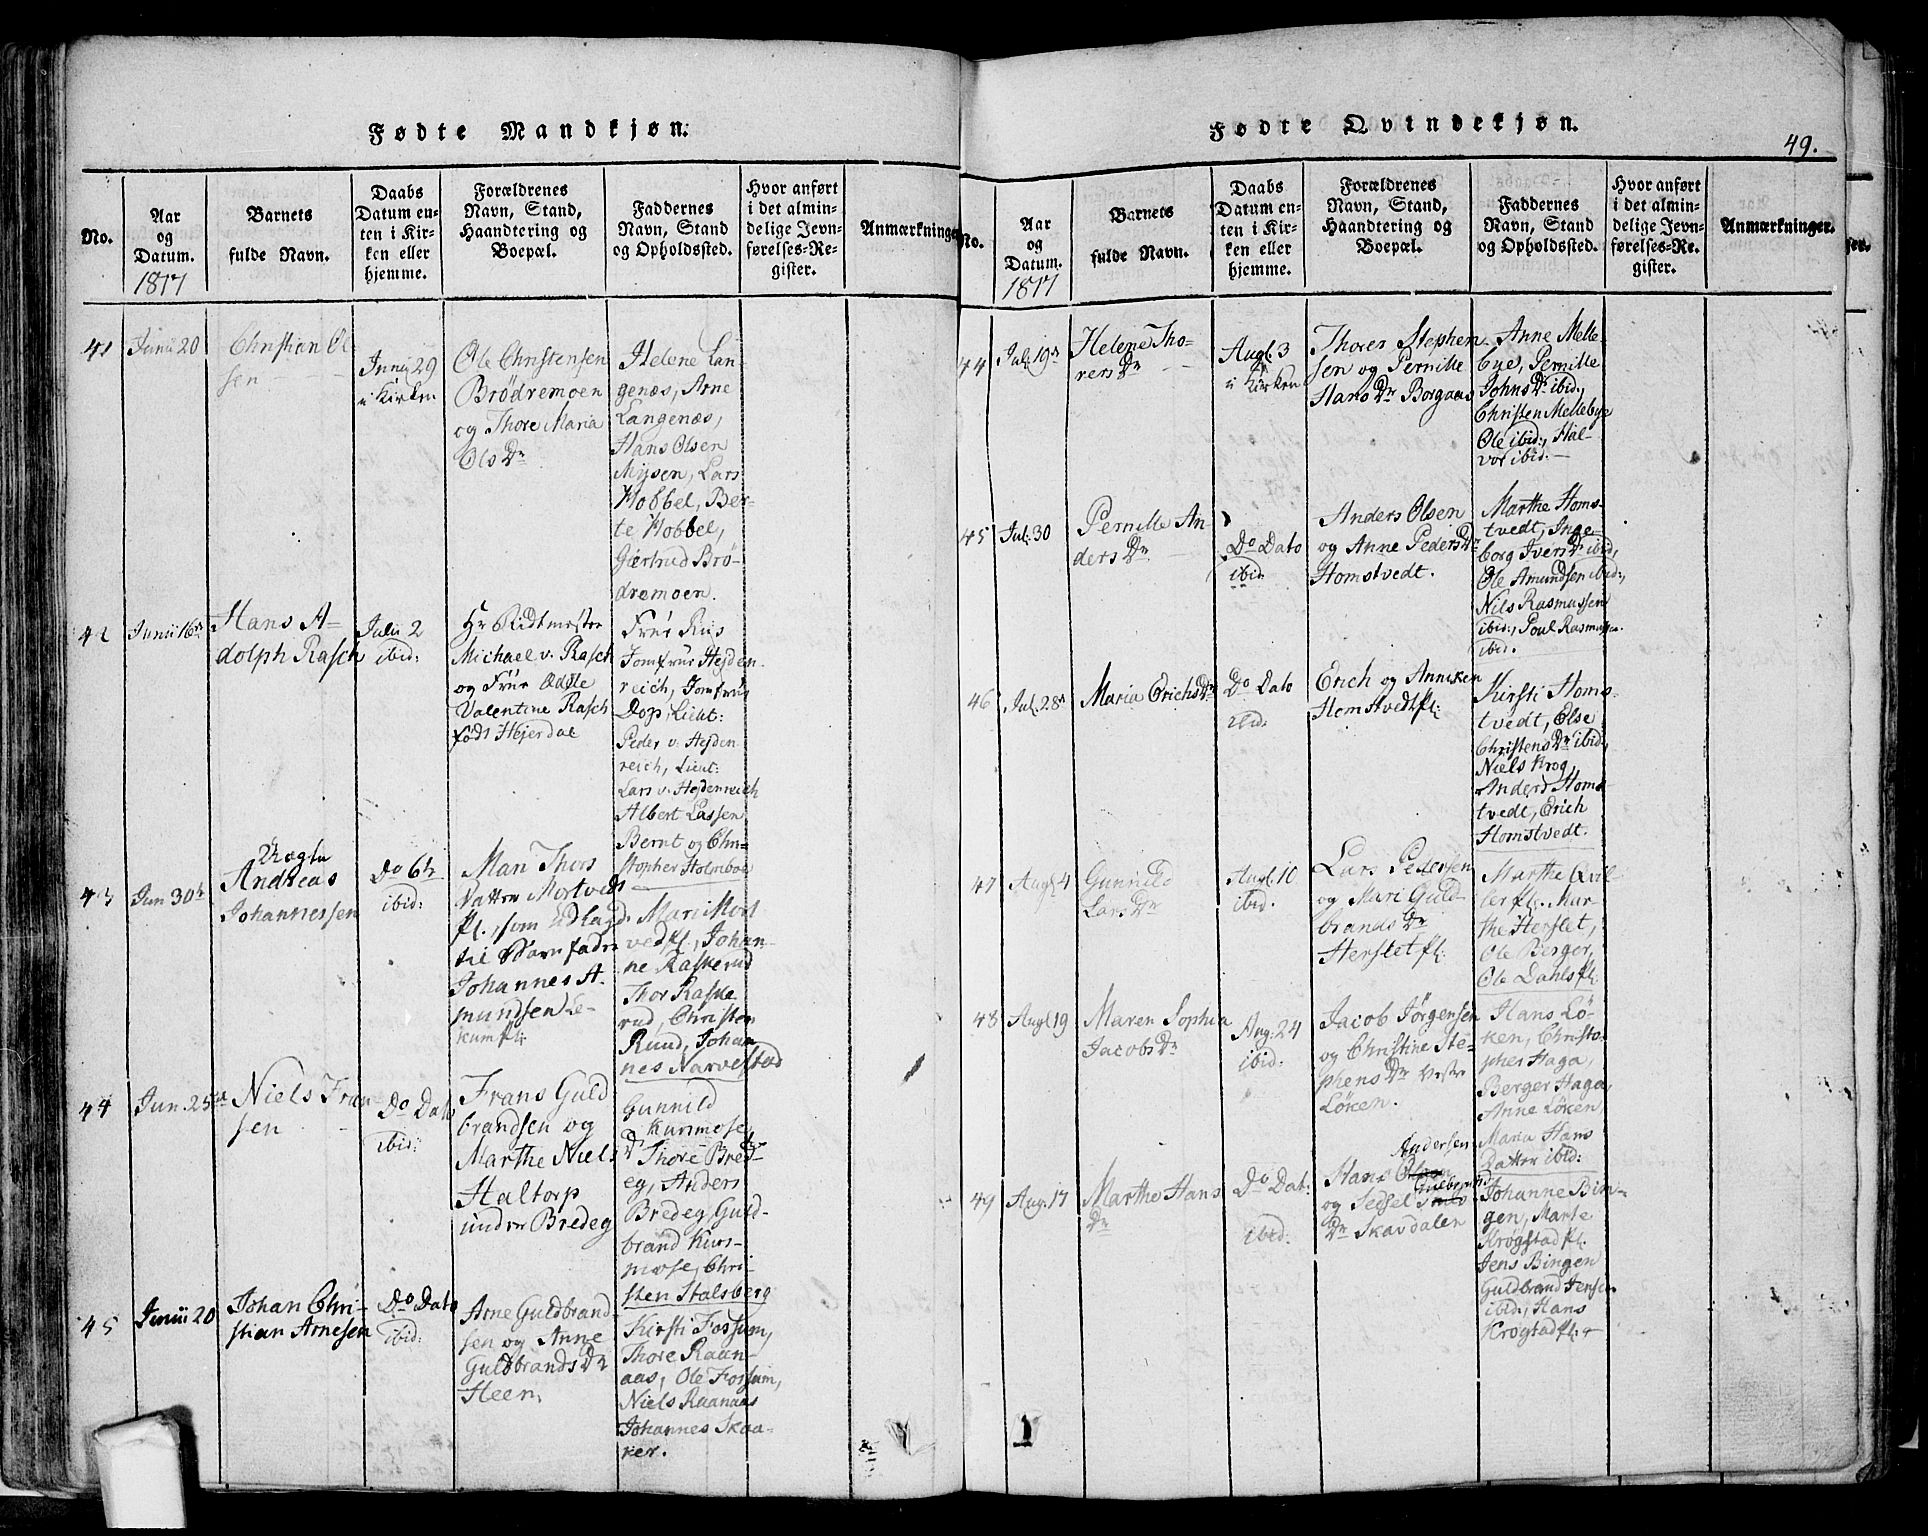 SAO, Eidsberg prestekontor Kirkebøker, F/Fa/L0007: Ministerialbok nr. I 7, 1814-1832, s. 49